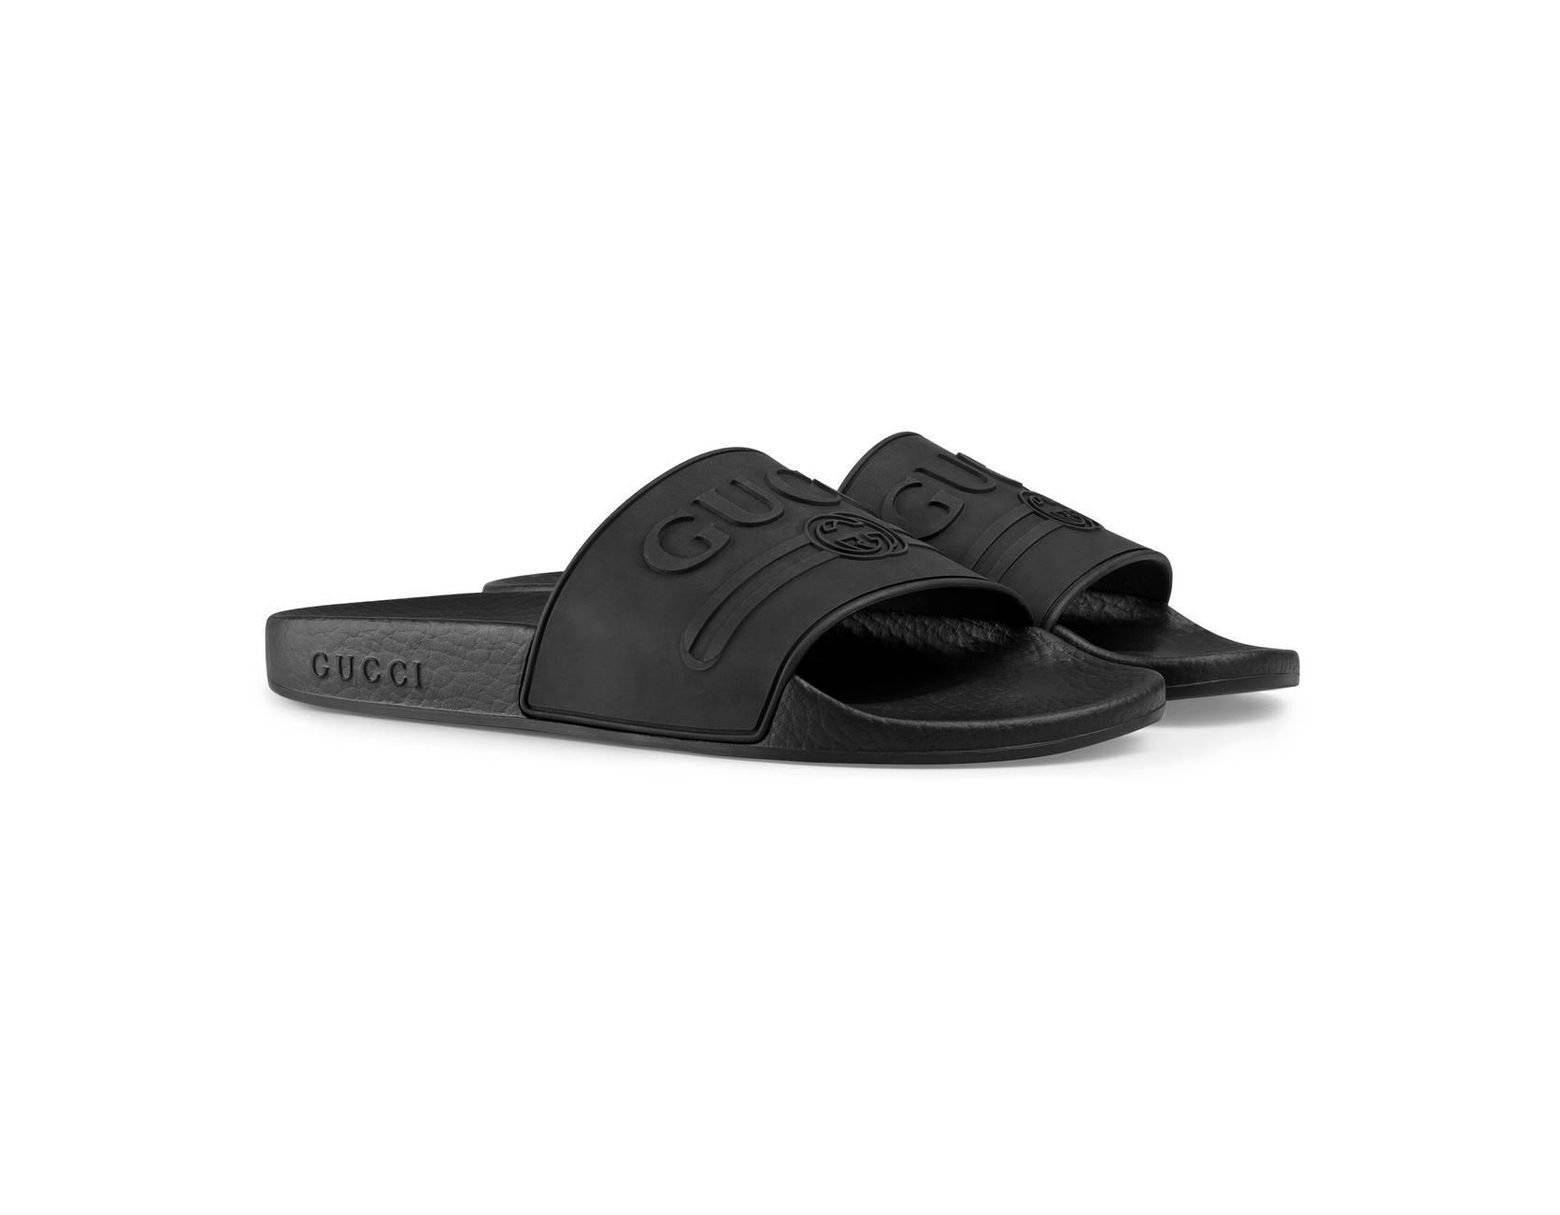 735cad7a71e Lyst - Gucci Pursuit Logo Slide Sandal in Black - Save 22%